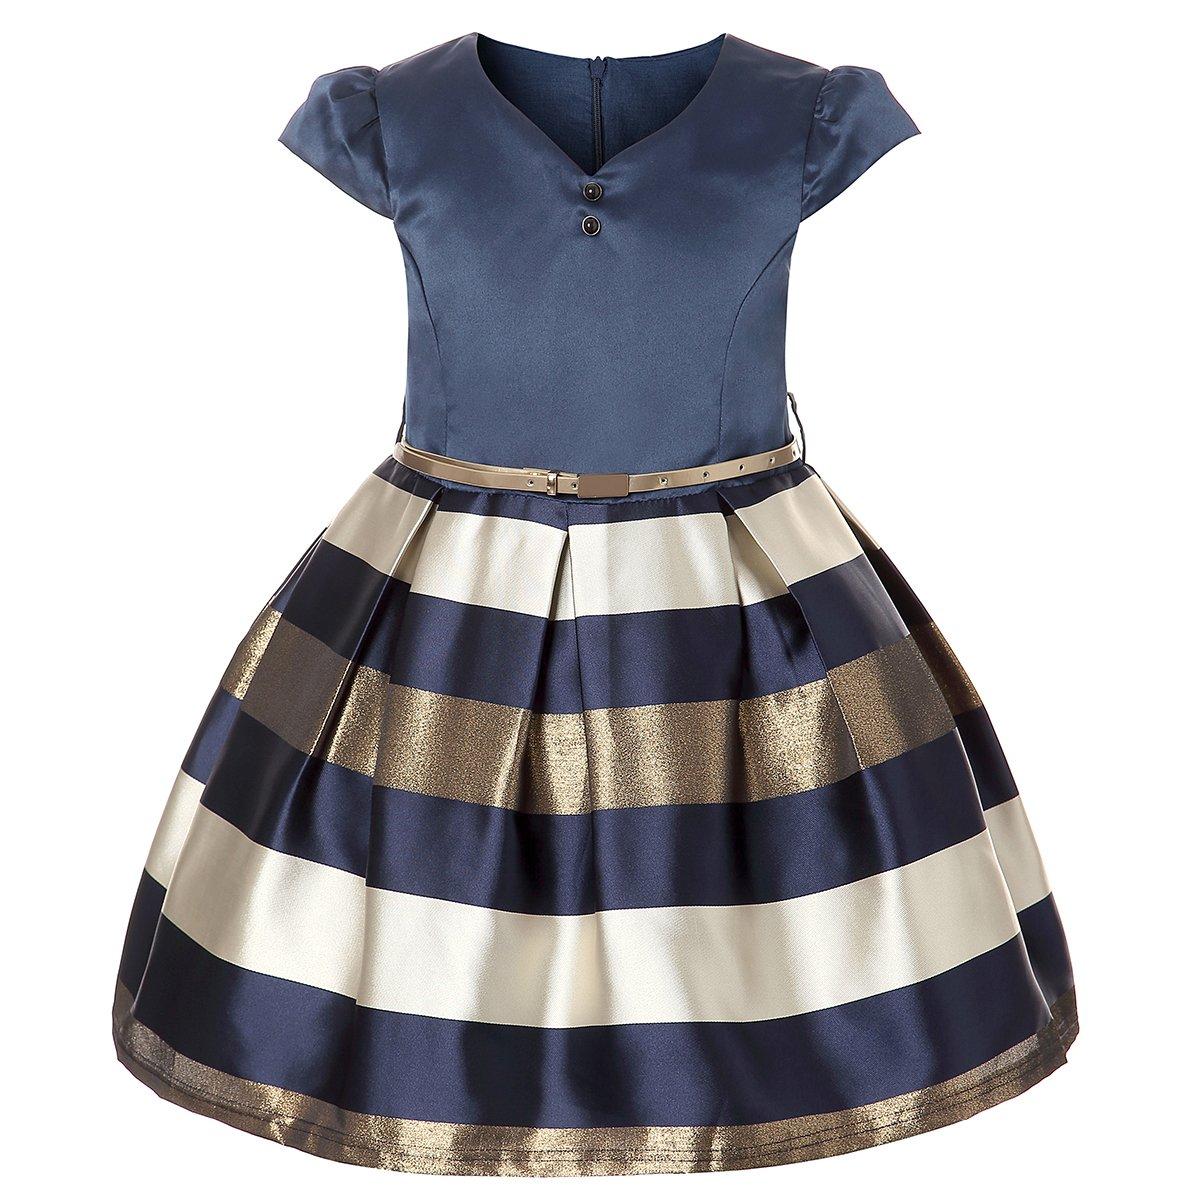 ZaH Girl Dress Kids Ruffles Lace Party Wedding Bridesmaid Dresses